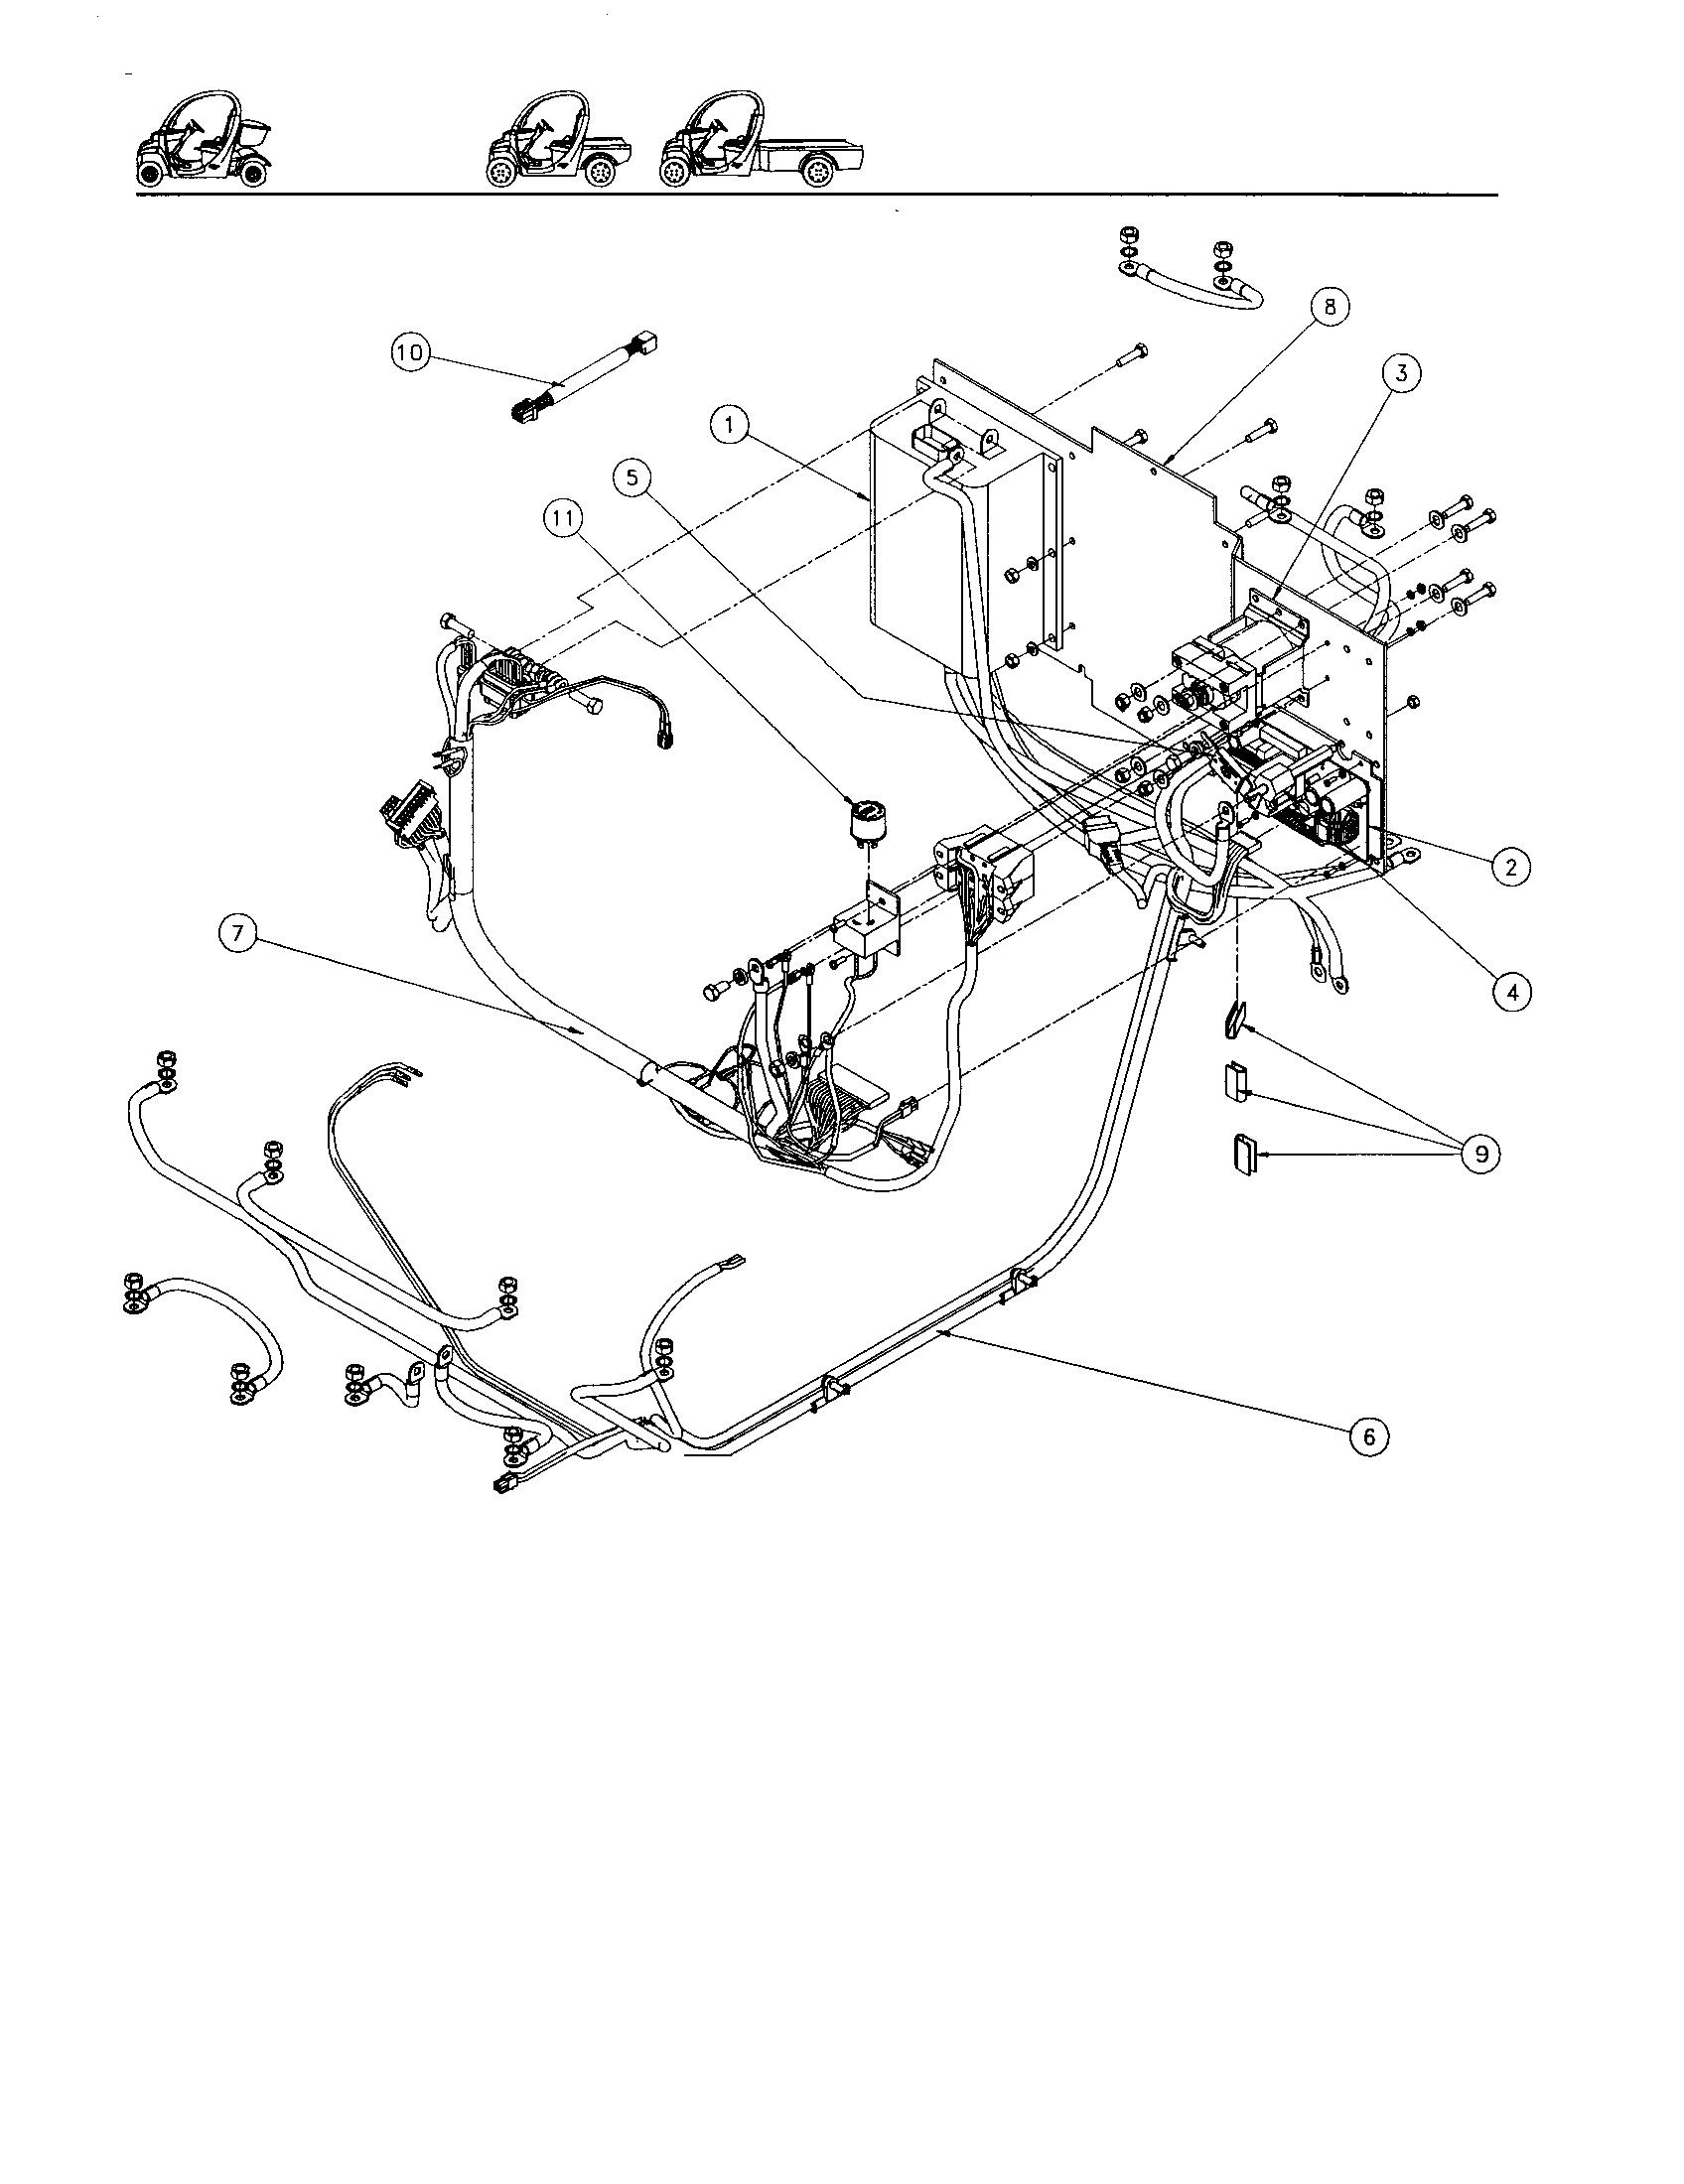 Gem E825 Wiring Diagram - Car Fuse Box For Sale -  2006cruisers.yenpancane.jeanjaures37.fr | Gem Car Fuse Diagram |  | Wiring Diagram Resource